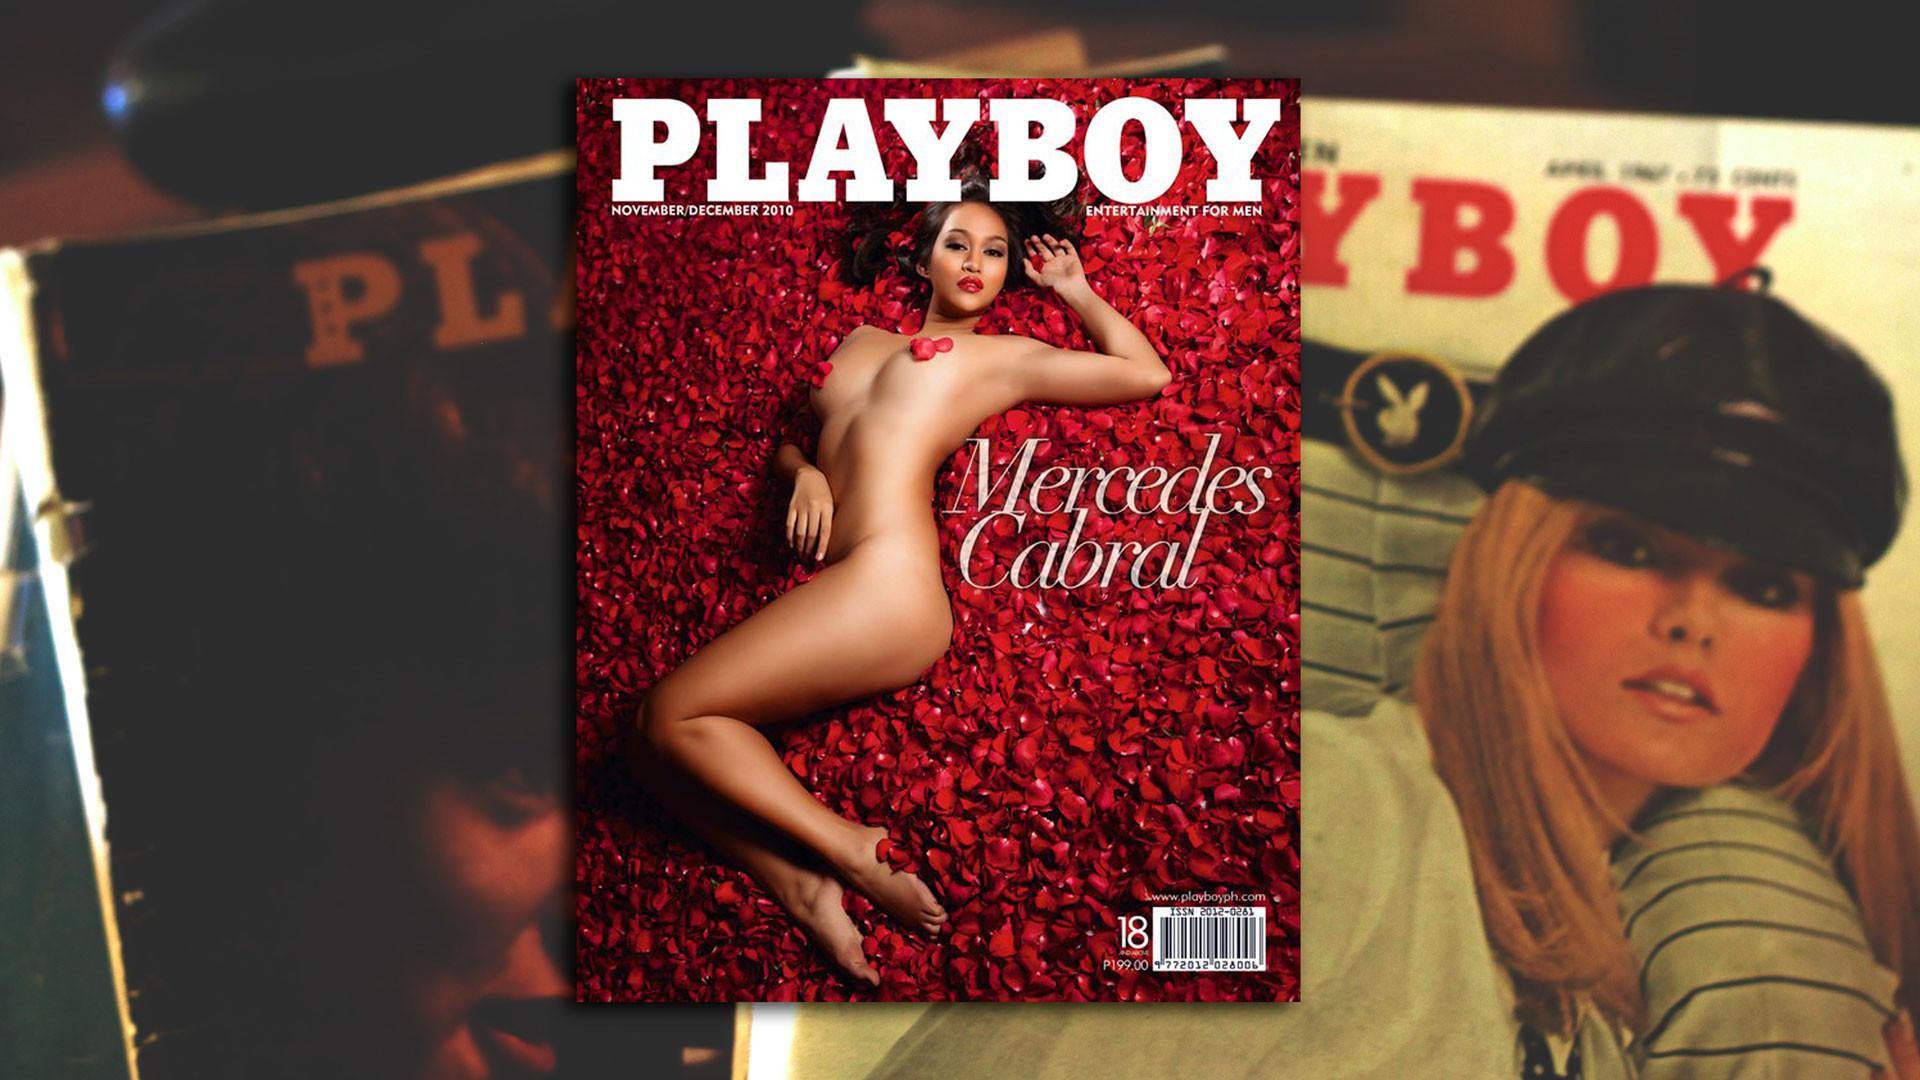 "<p>Коллаж &copy; L!FE.&nbsp;Фото: &copy; flickr/AbrilSicairos &copy;<a href=""https://magazinesarchive.com/playboy_ph/2010/11/"" target=""_blank"">&nbsp;magazinesarchive.com</a></p>"